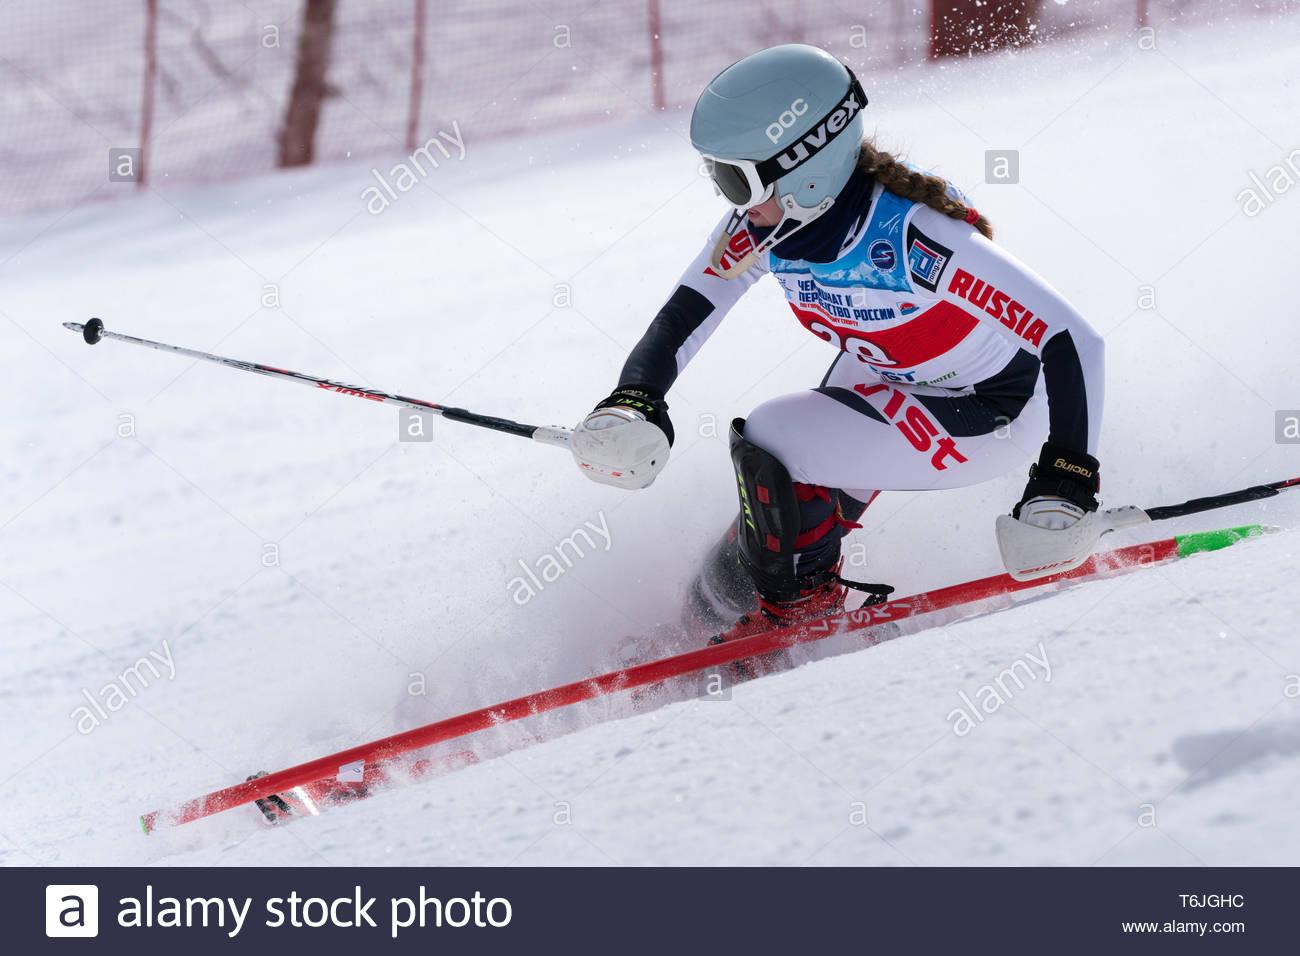 MOROZNAYA MOUNTAIN, KAMCHATKA PENINSULA, RUSSIA - MARCH 29, 2019: Russian Alpine Skiing Cup, International Ski Federation Championship, slalom. Mount  - Stock Image